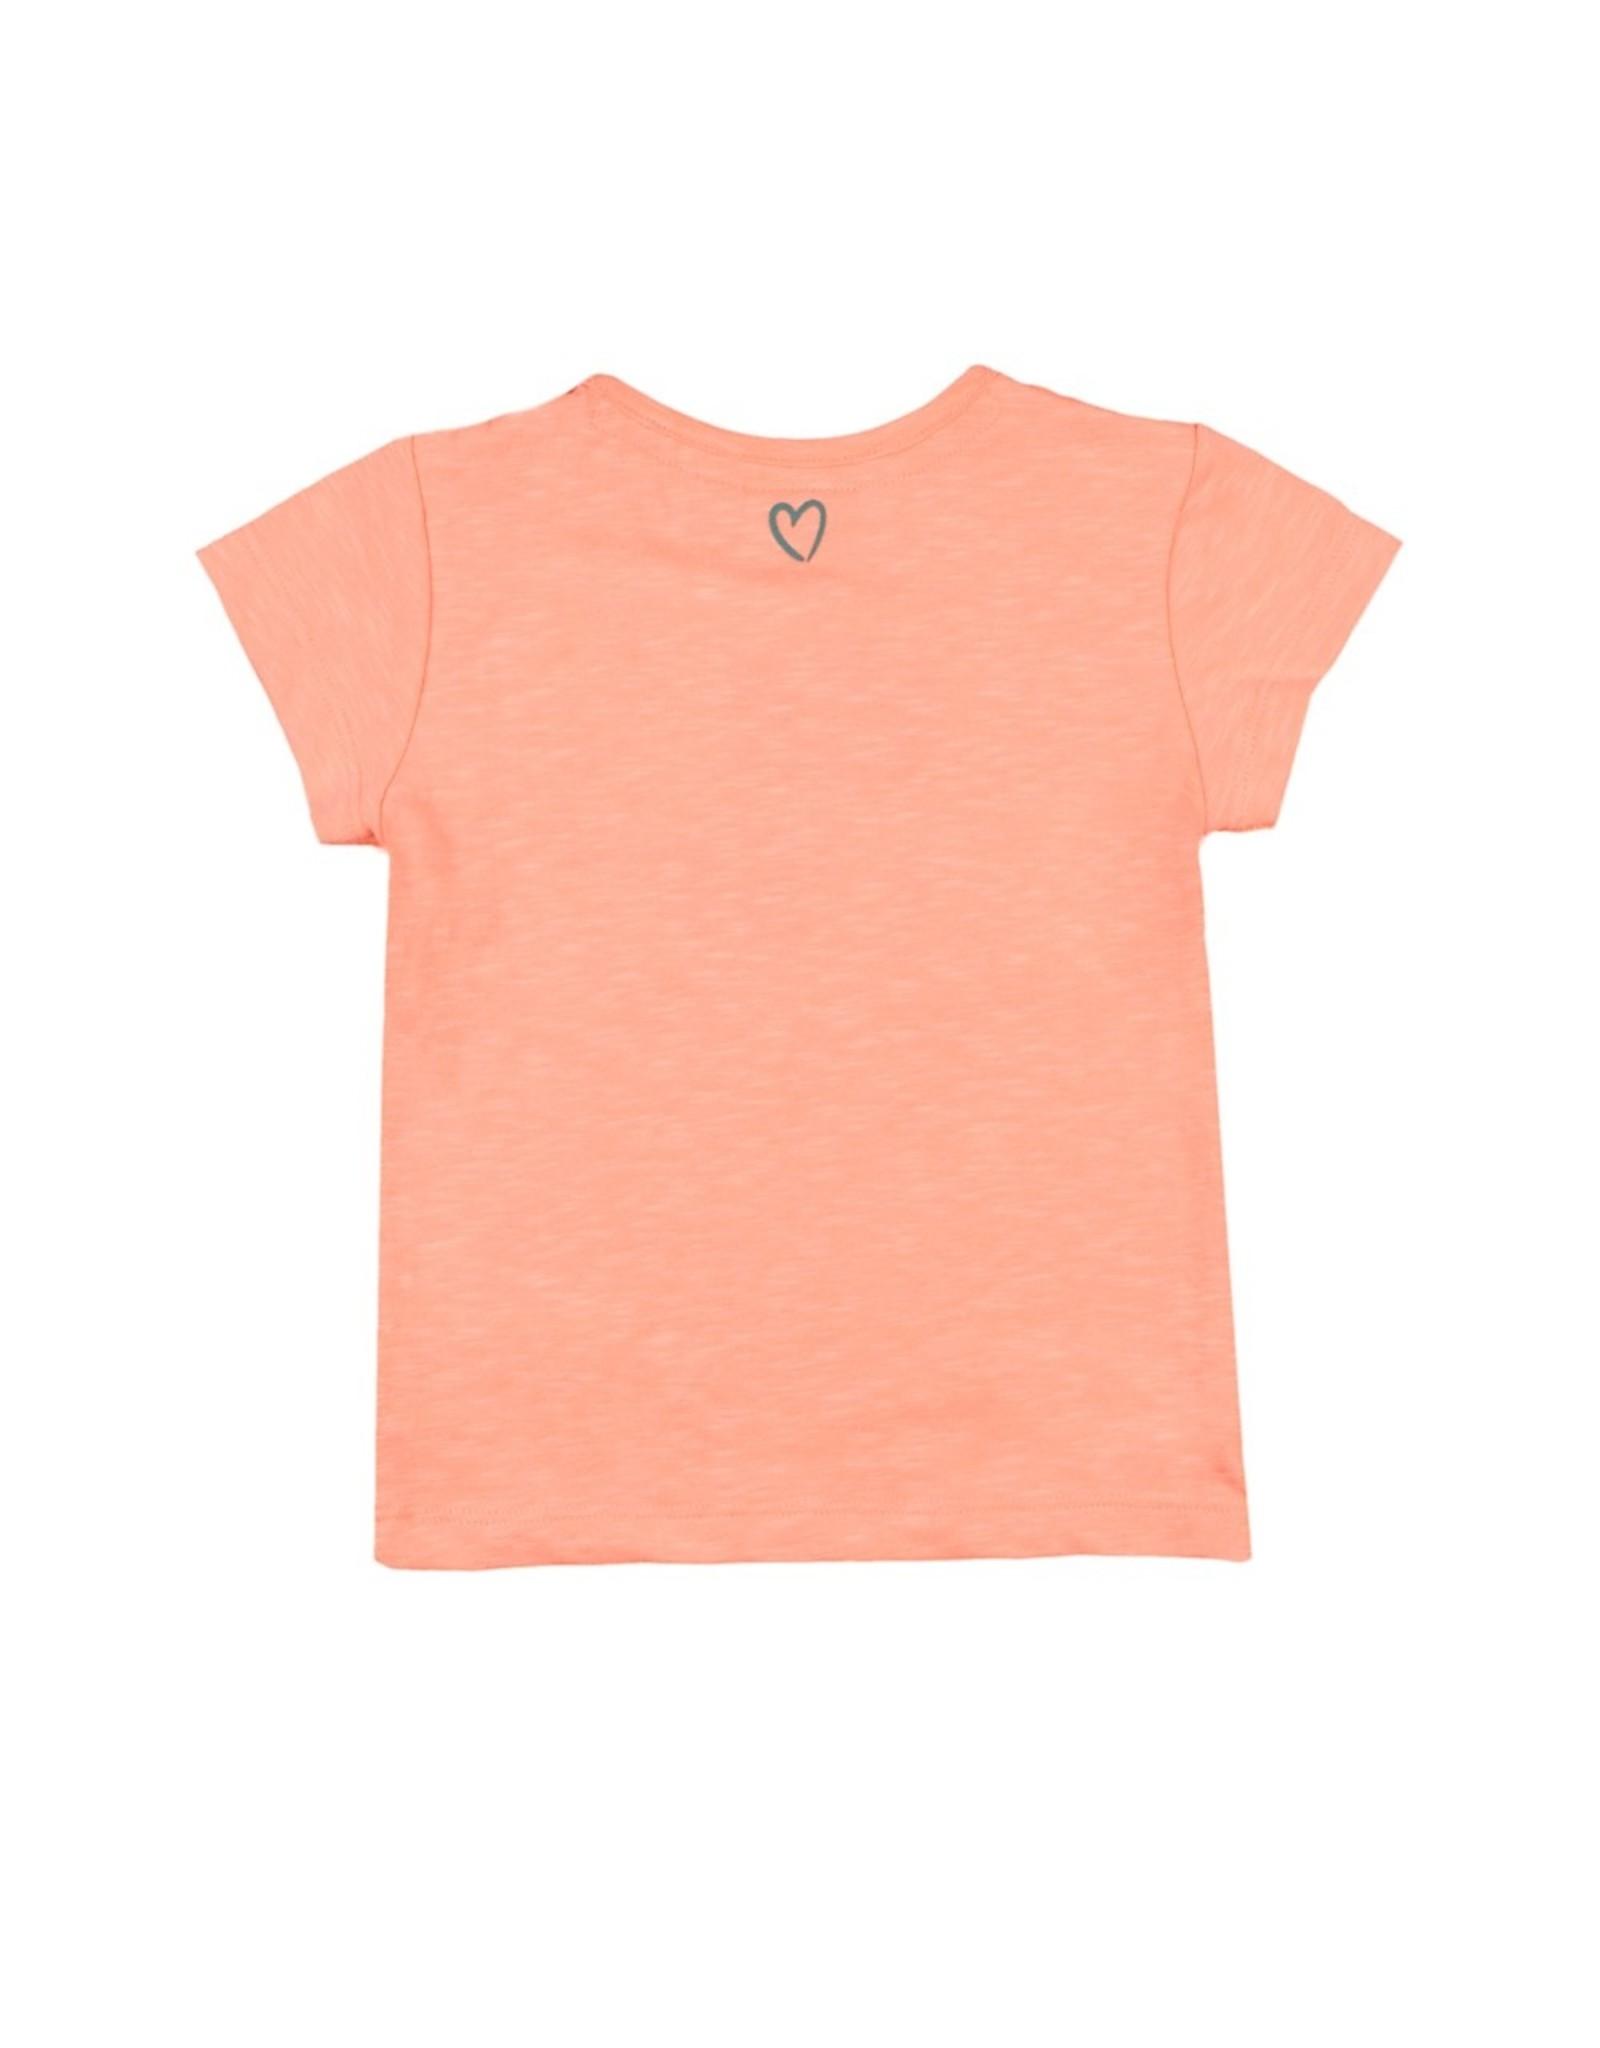 Feetje T-shirt Fiesta Siesta - Botanic Blush maat 68